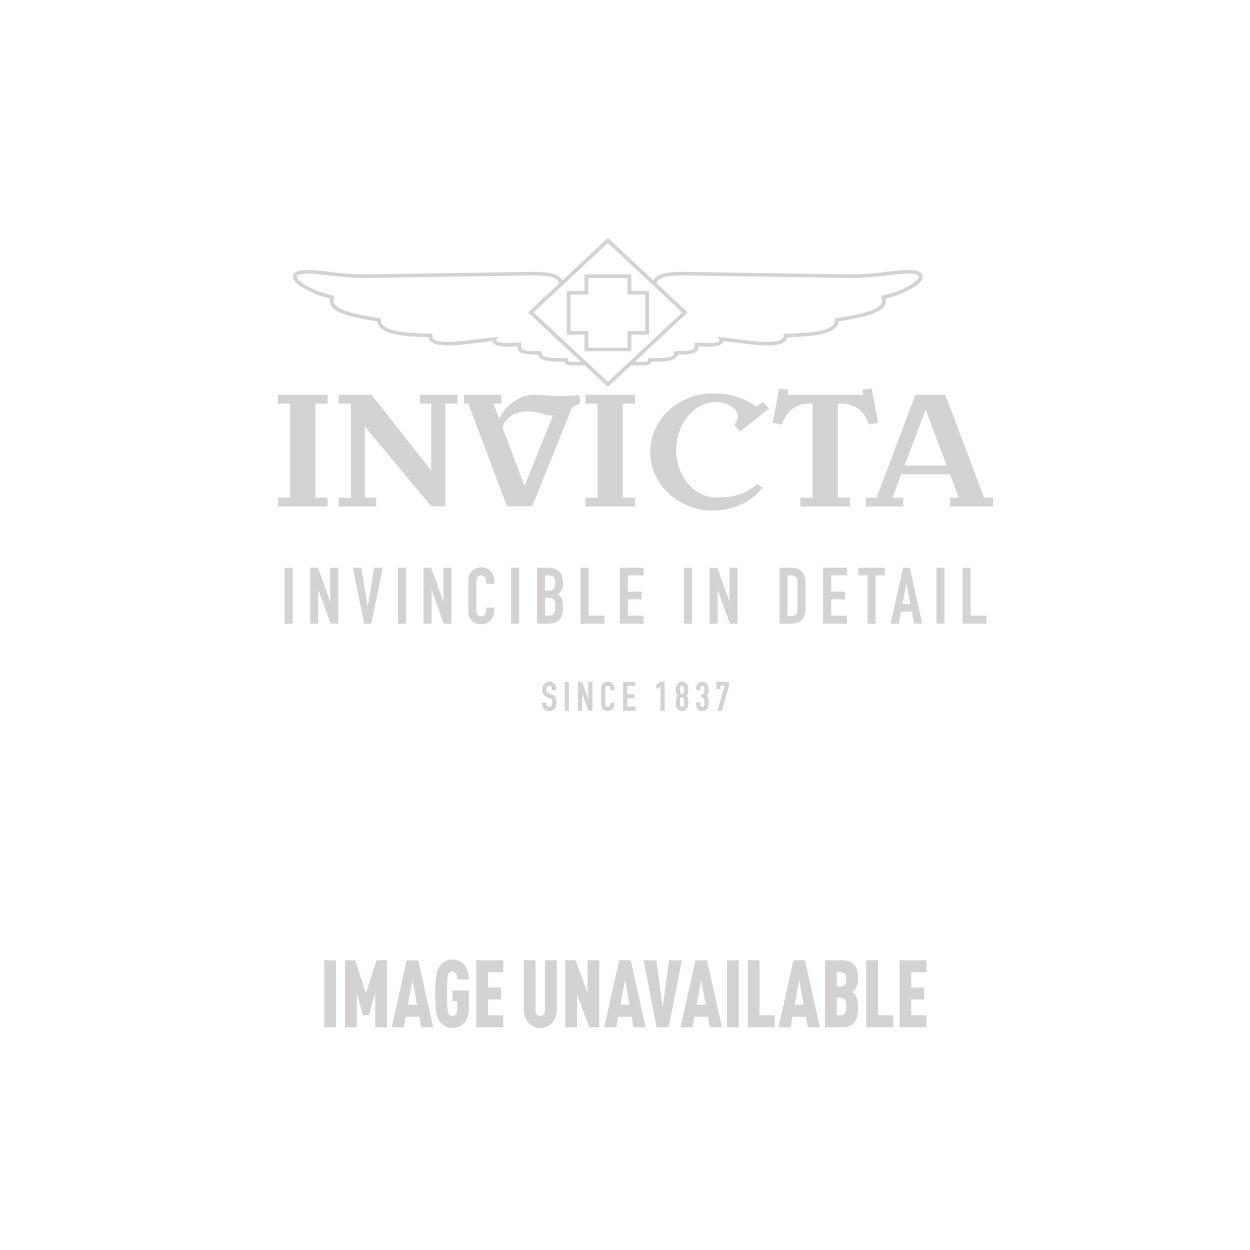 Invicta Wildflower Swiss Movement Quartz Watch - Stainless Steel case Stainless Steel band - Model 5377